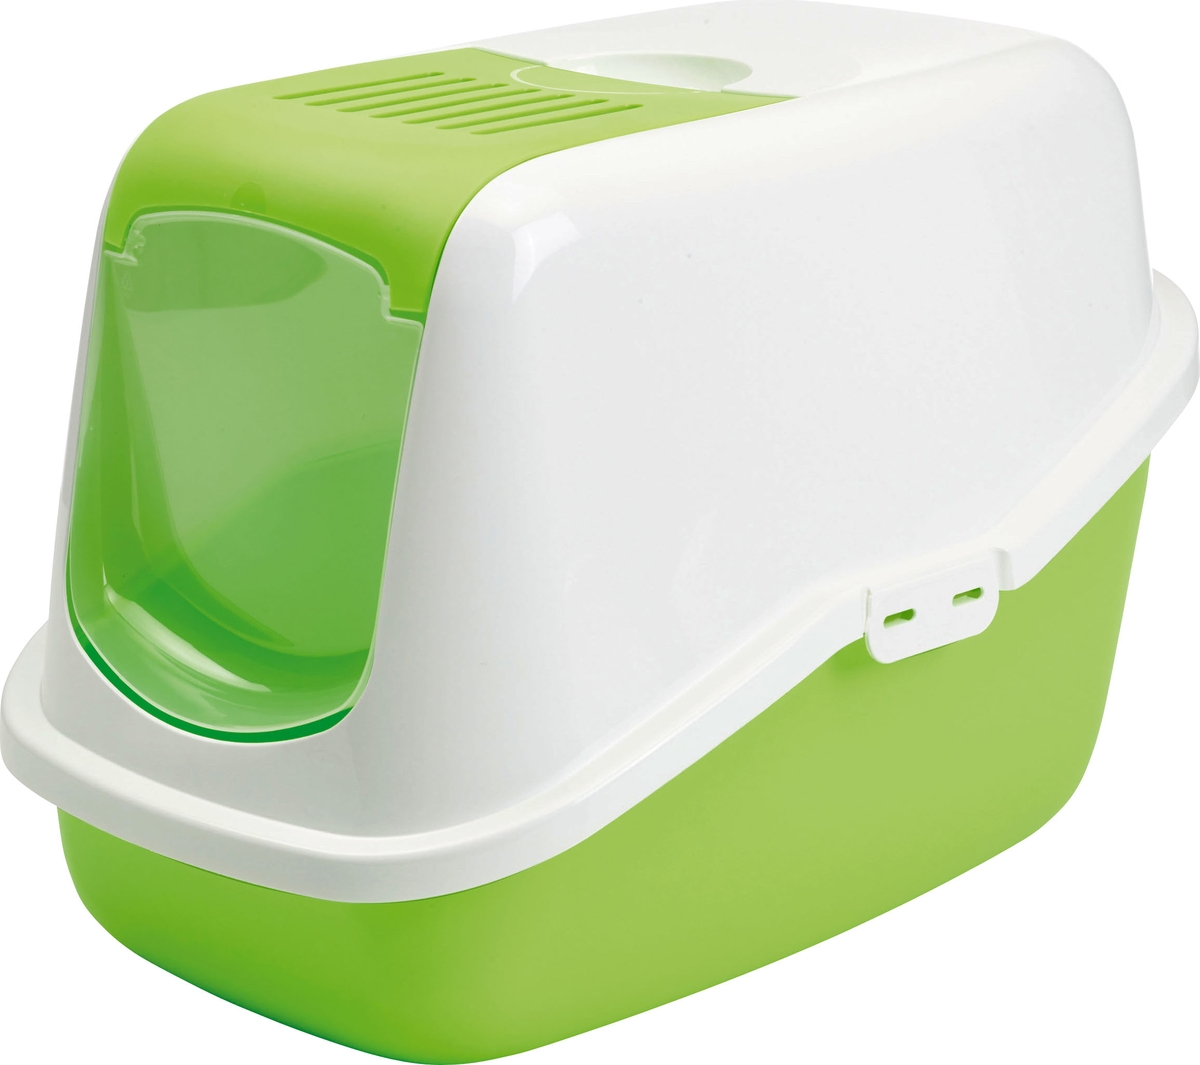 цена на Туалет для кошек Savic Nestor, цвет: белый, зеленый лимон, 56 х 39 х 38,5 см